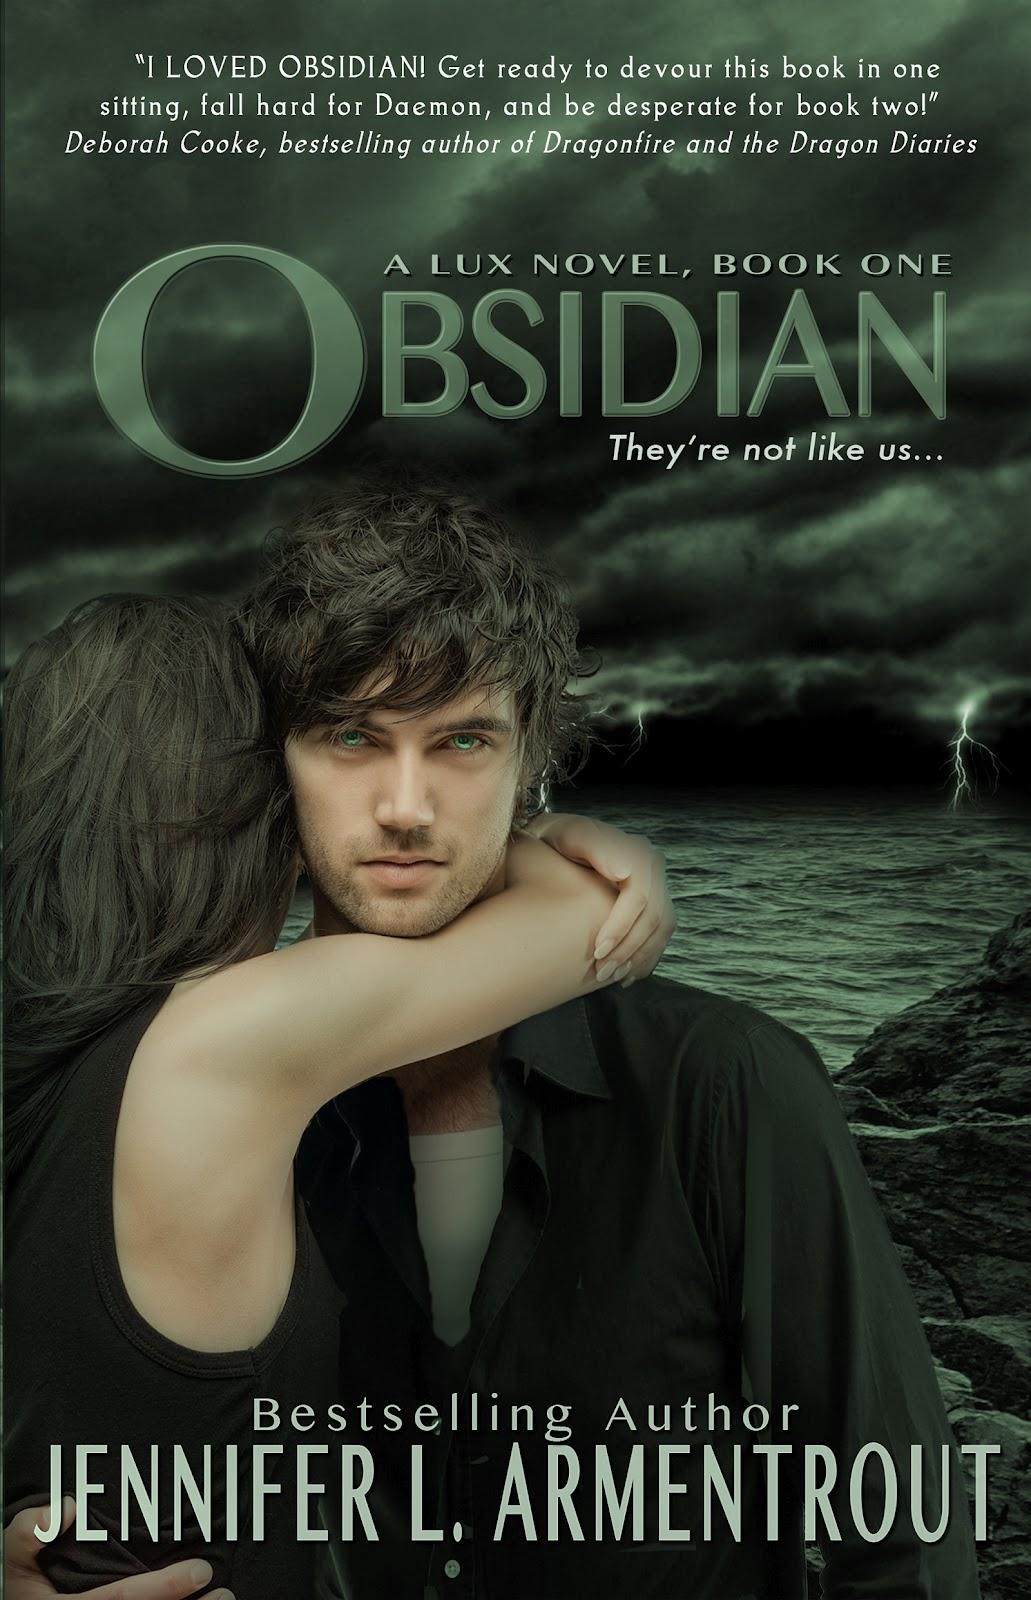 http://4.bp.blogspot.com/-qsSLfL77p8w/T2fAfNe2t0I/AAAAAAAAAdY/gDzRAGKtKuY/s1600/obsidian-cover5.jpg